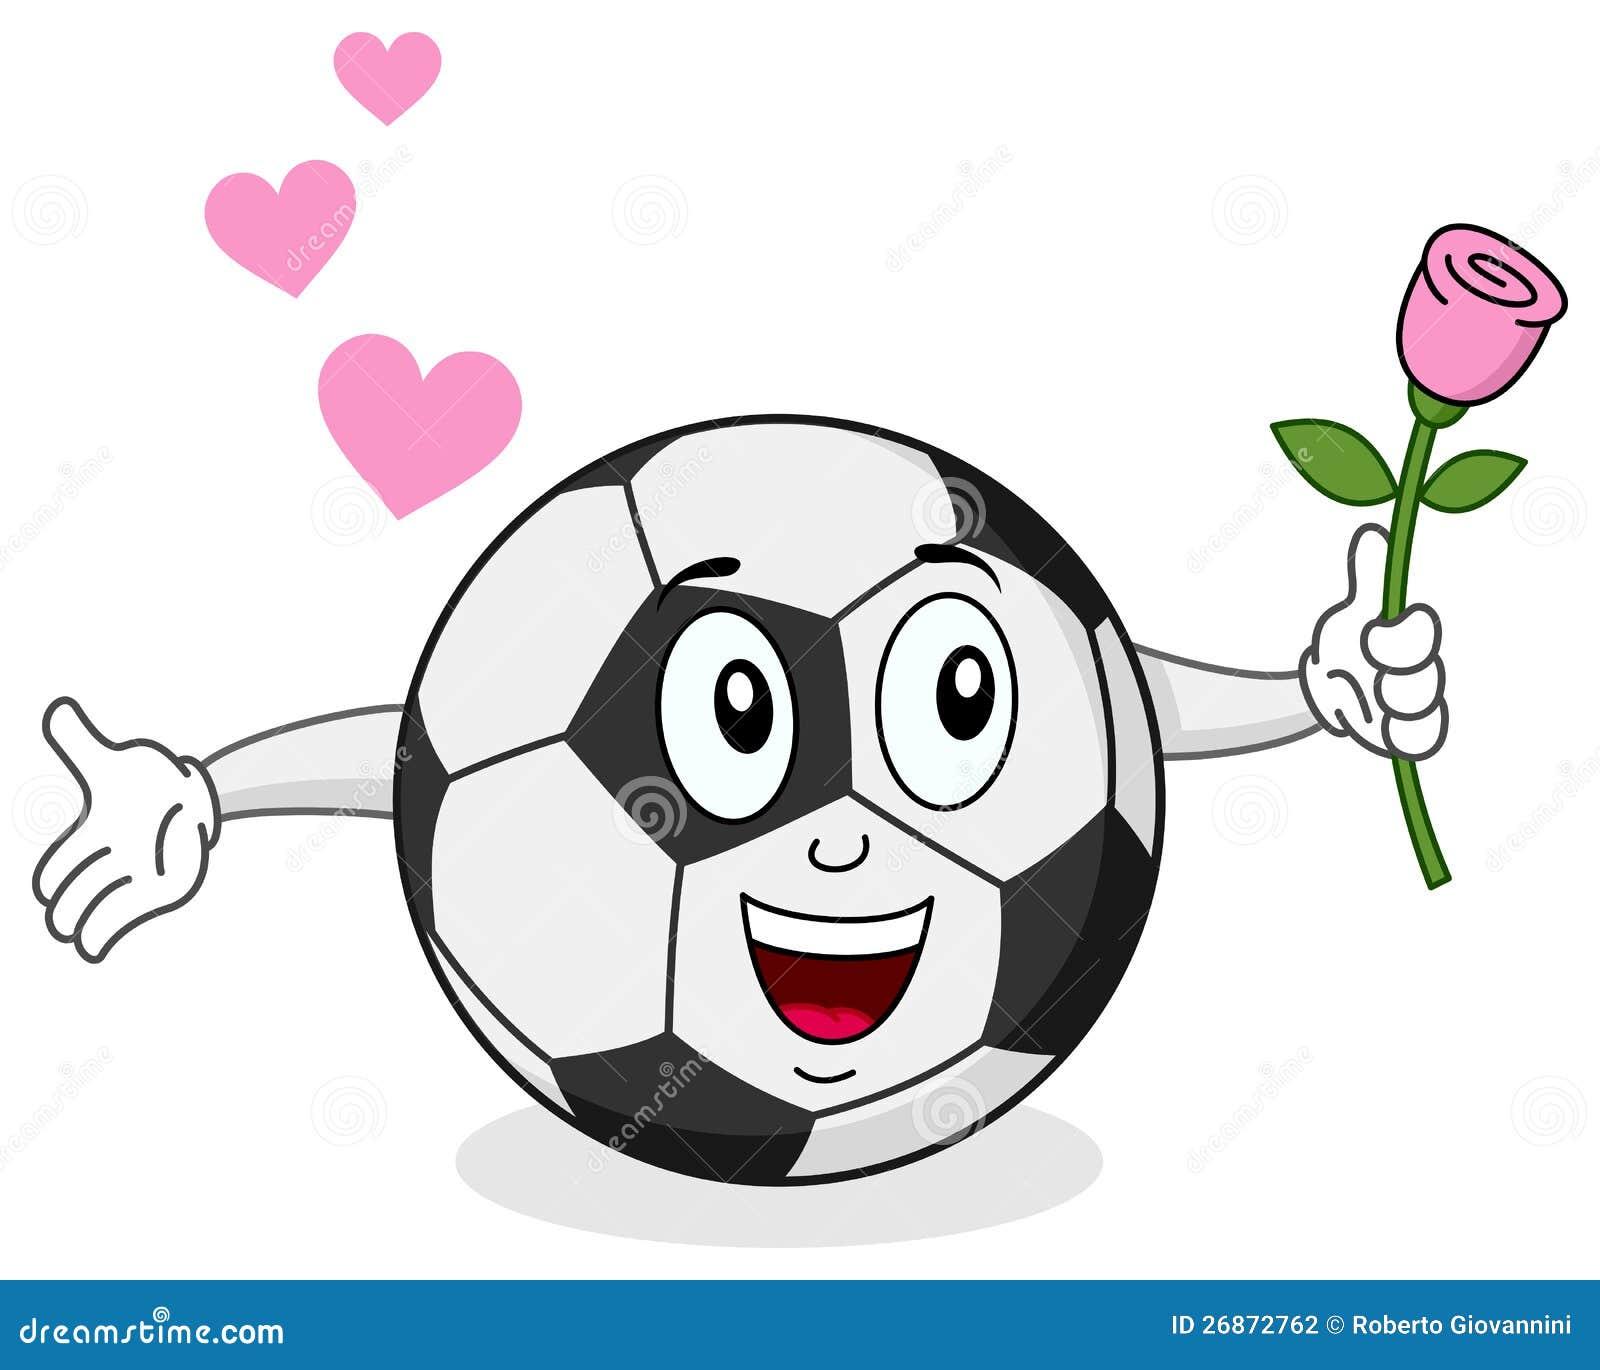 Happy Valentines Day Animated Clip Art